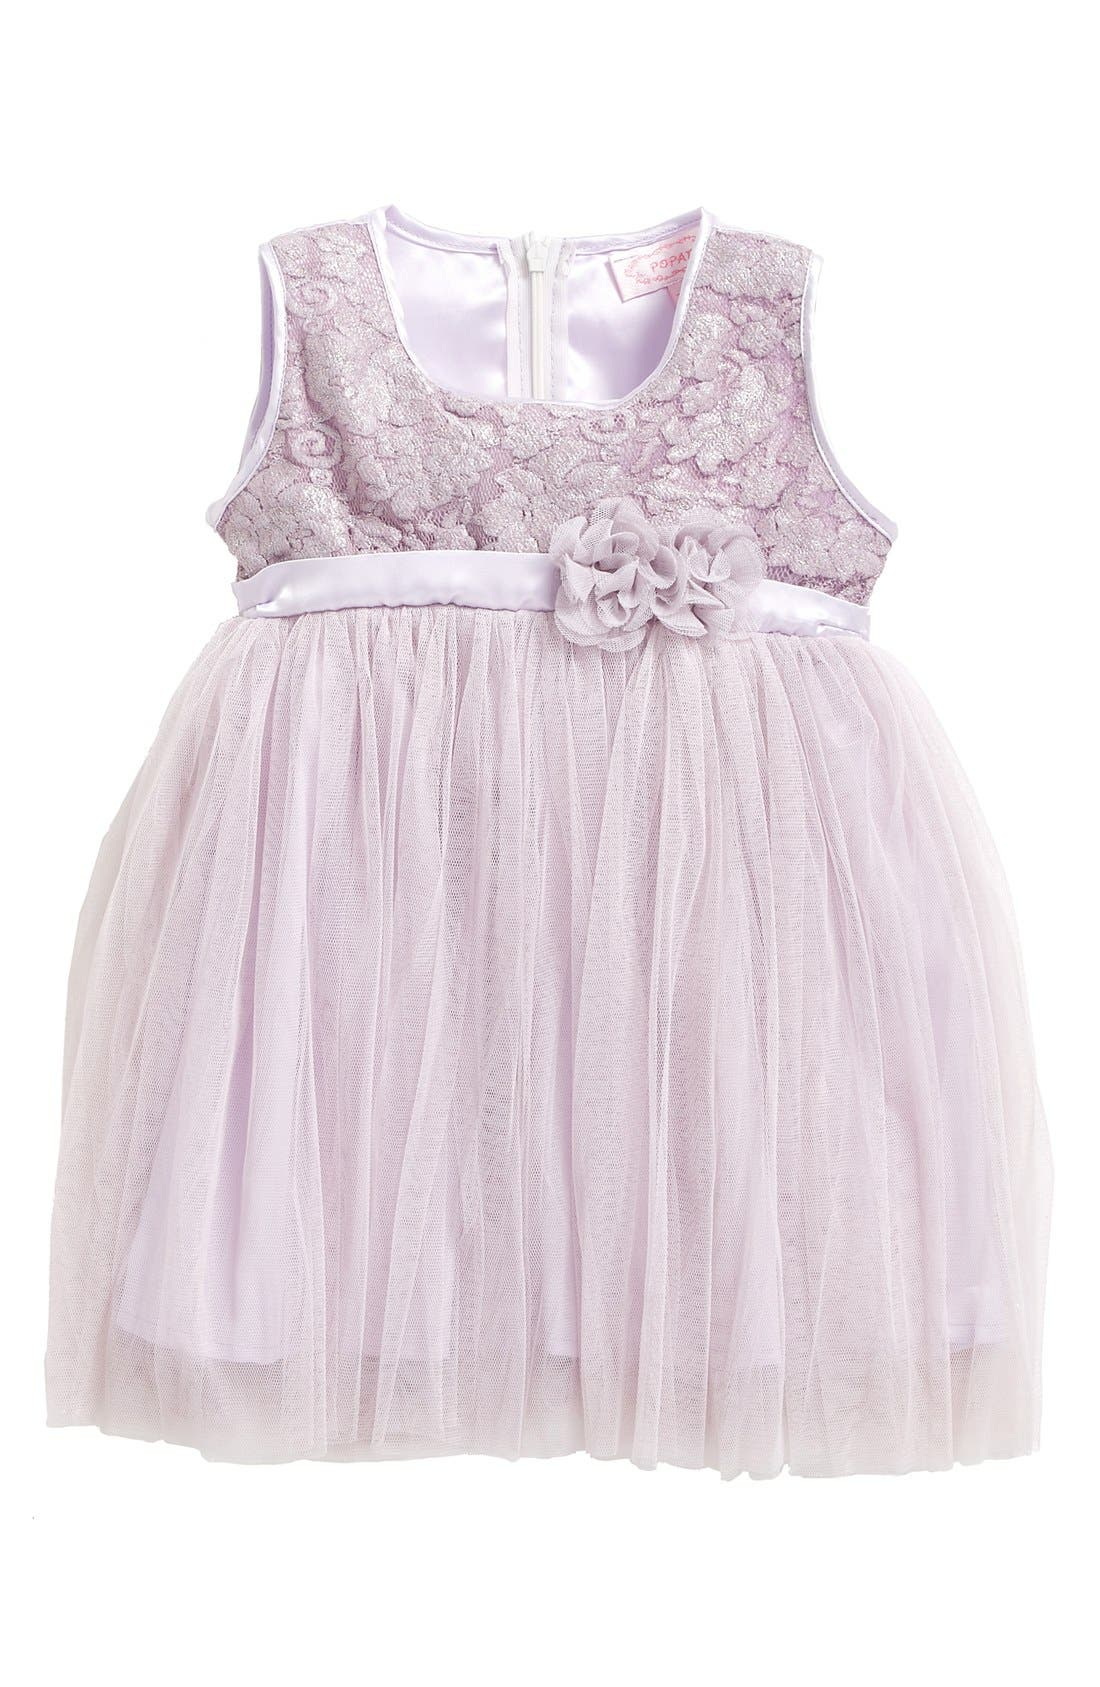 Main Image - Popatu Empire Waist Lace Dress (Baby Girls)